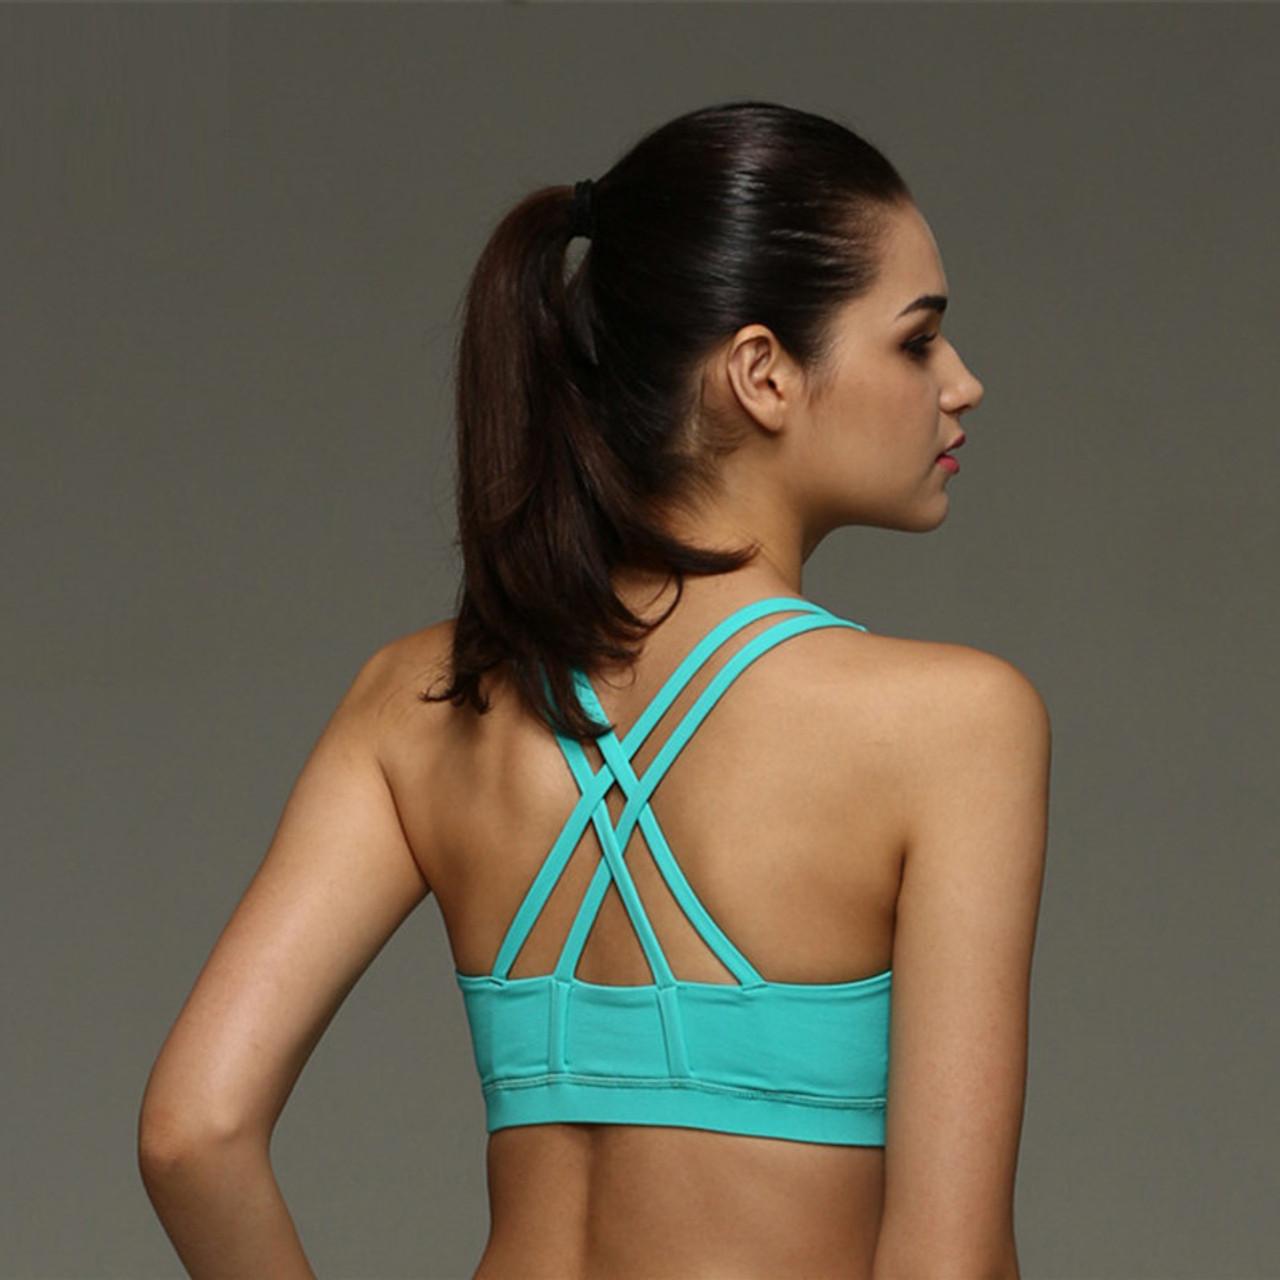 fbca631368c ... Mermaid Curve Sexy Back Cross Shockproof Sports Bras Women Gym Fitness  Seamless Yoga Bra Crop Top ...